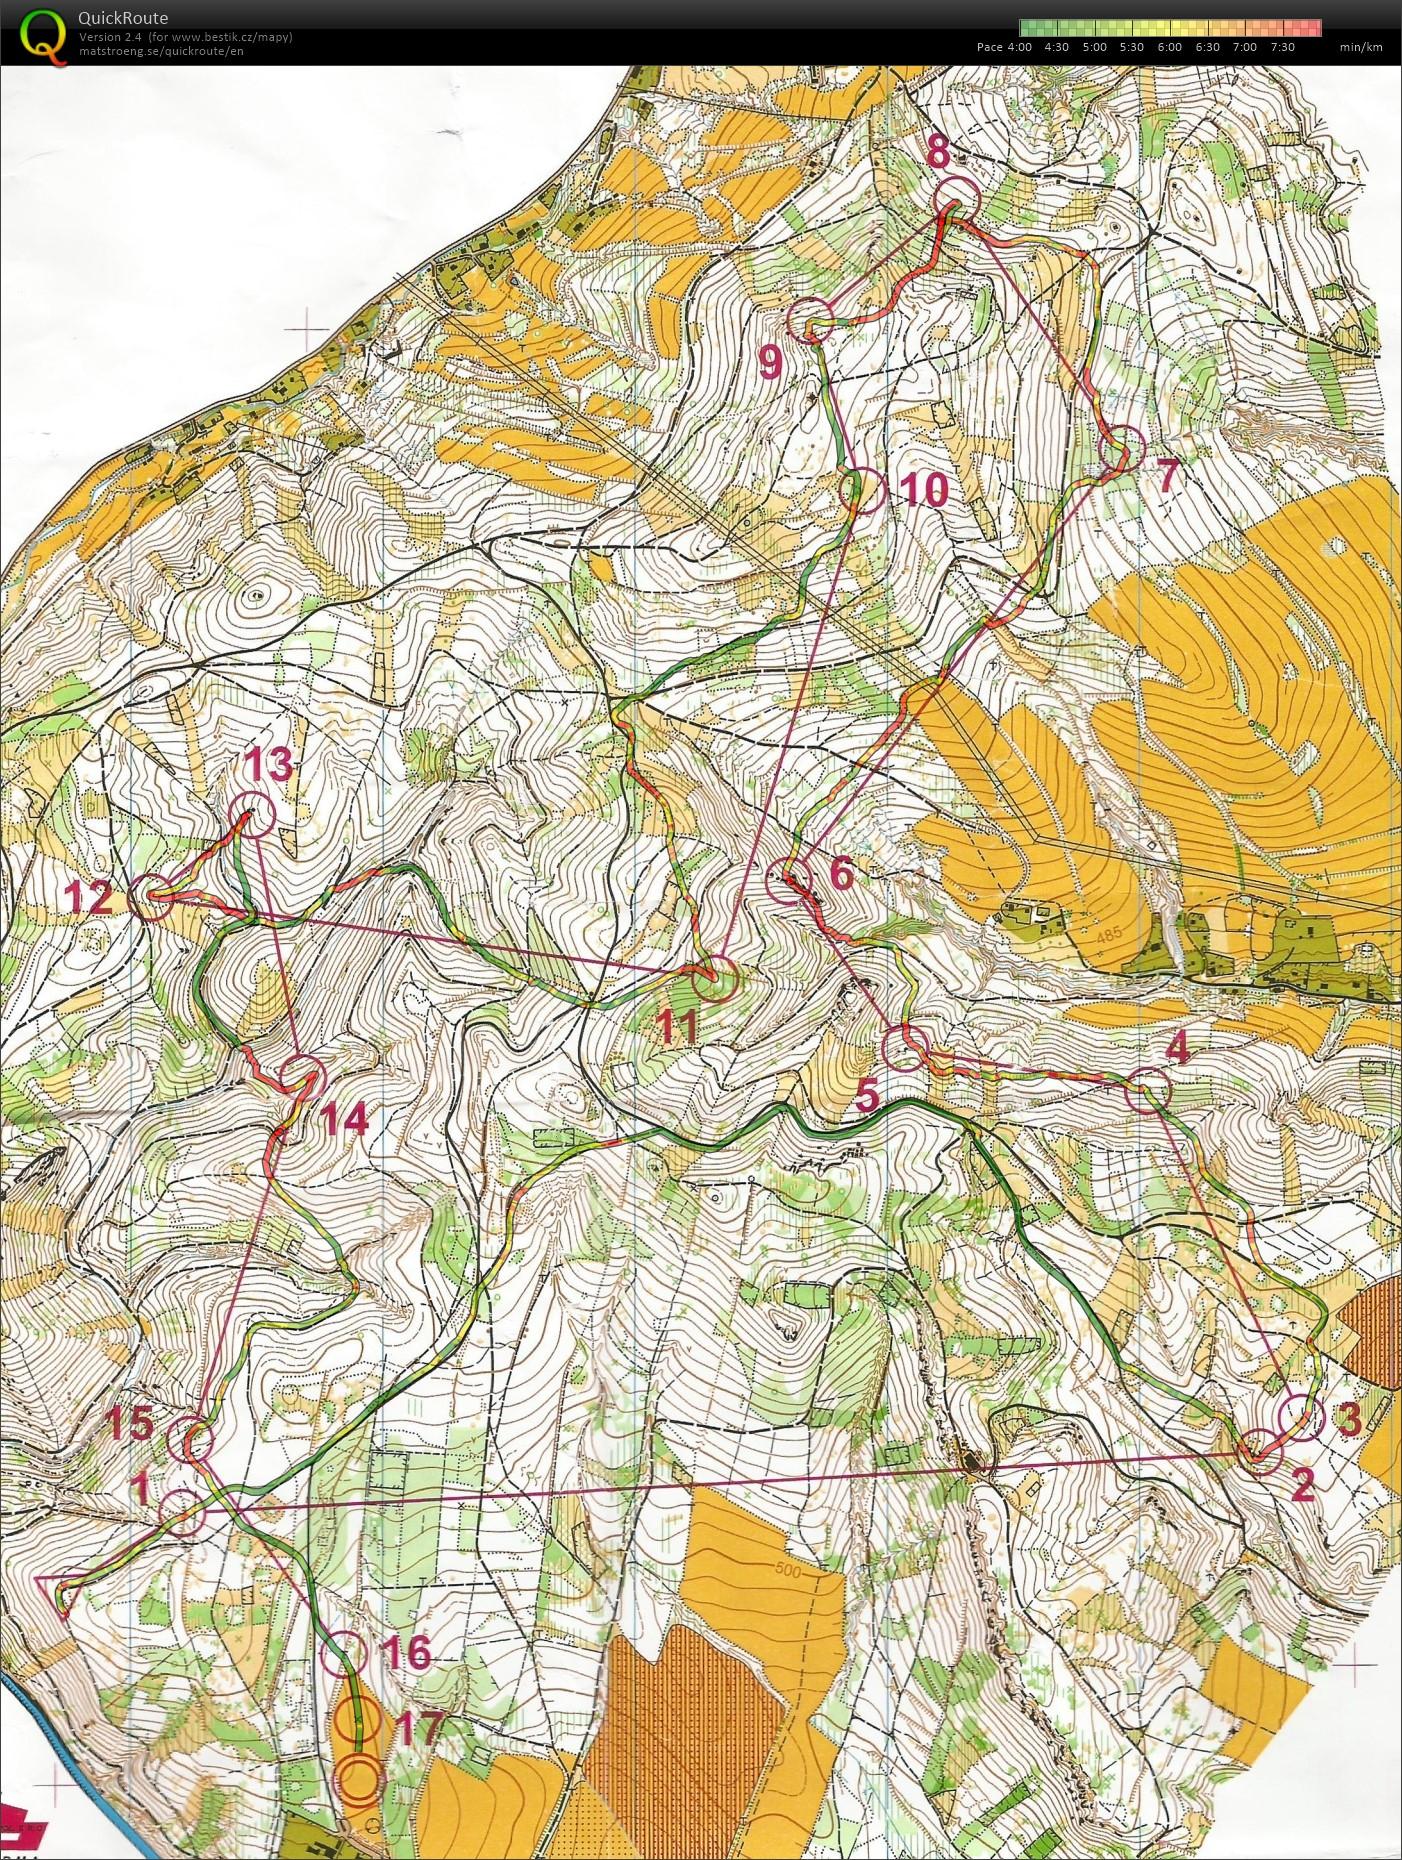 Vovo Mapy Za Trutnov Kratka 01 05 2016